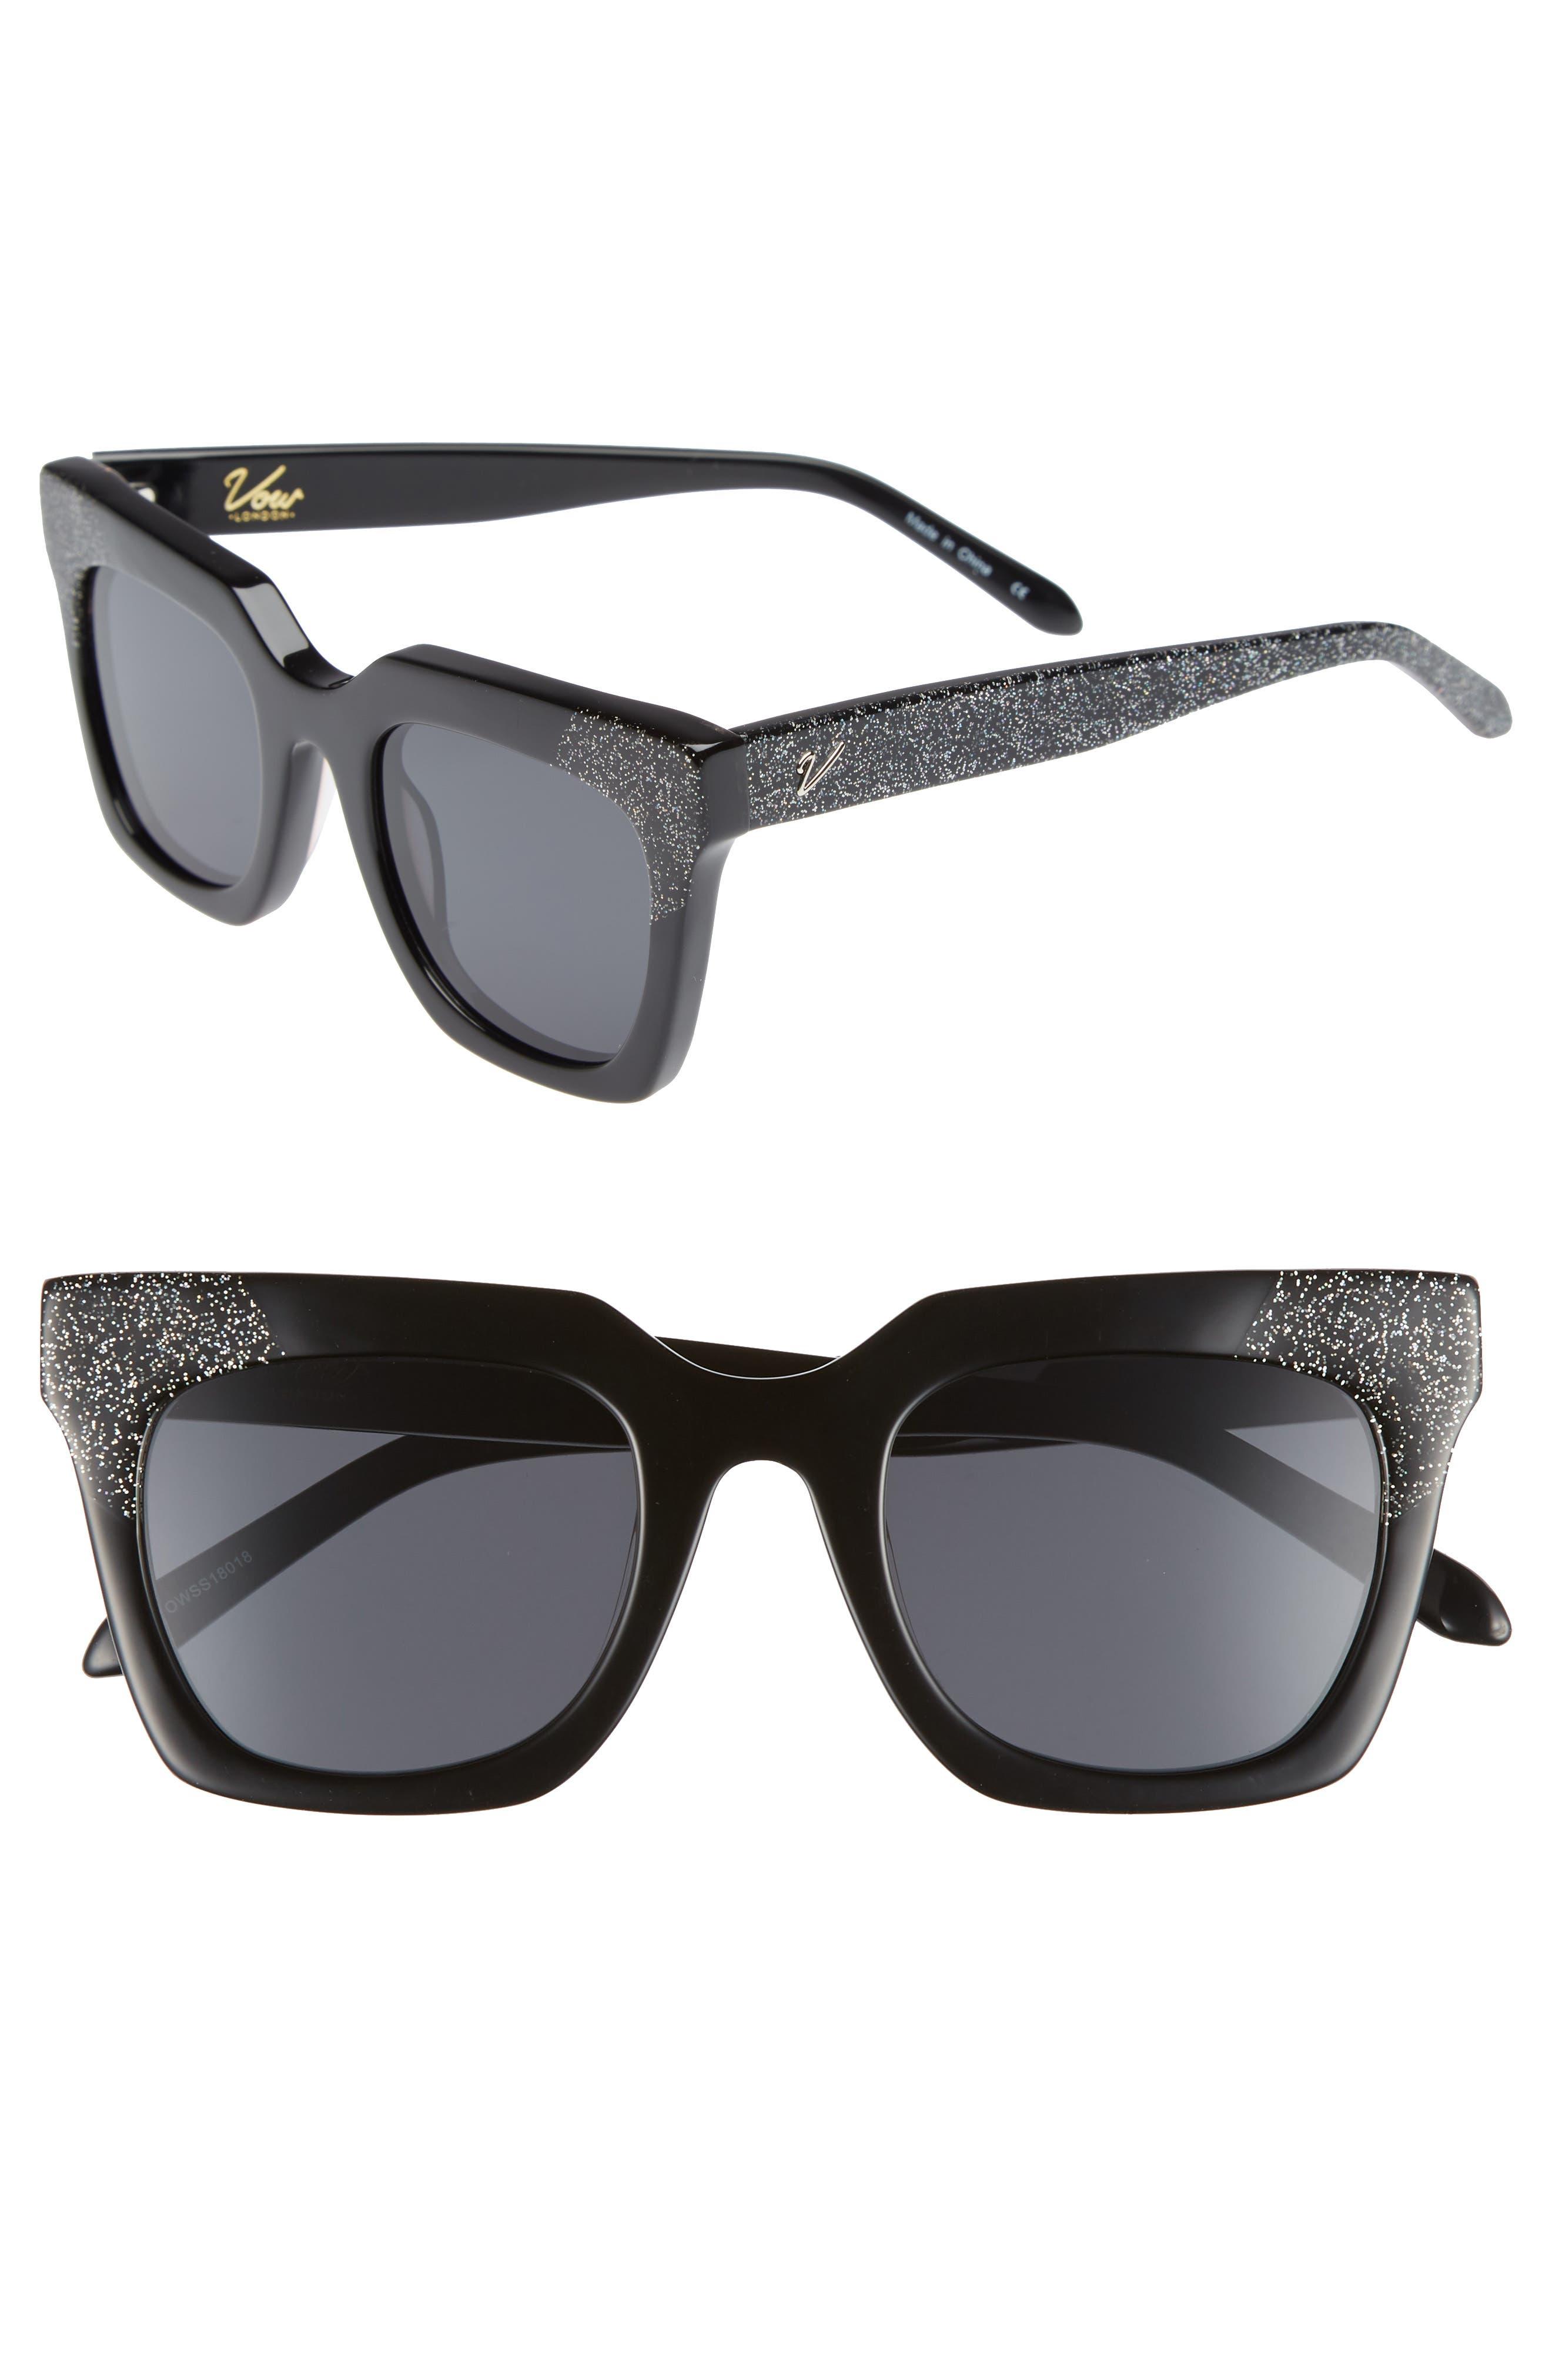 Riley 50mm Cat Eye Sunglasses,                             Main thumbnail 1, color,                             BLACK/ SMOKE